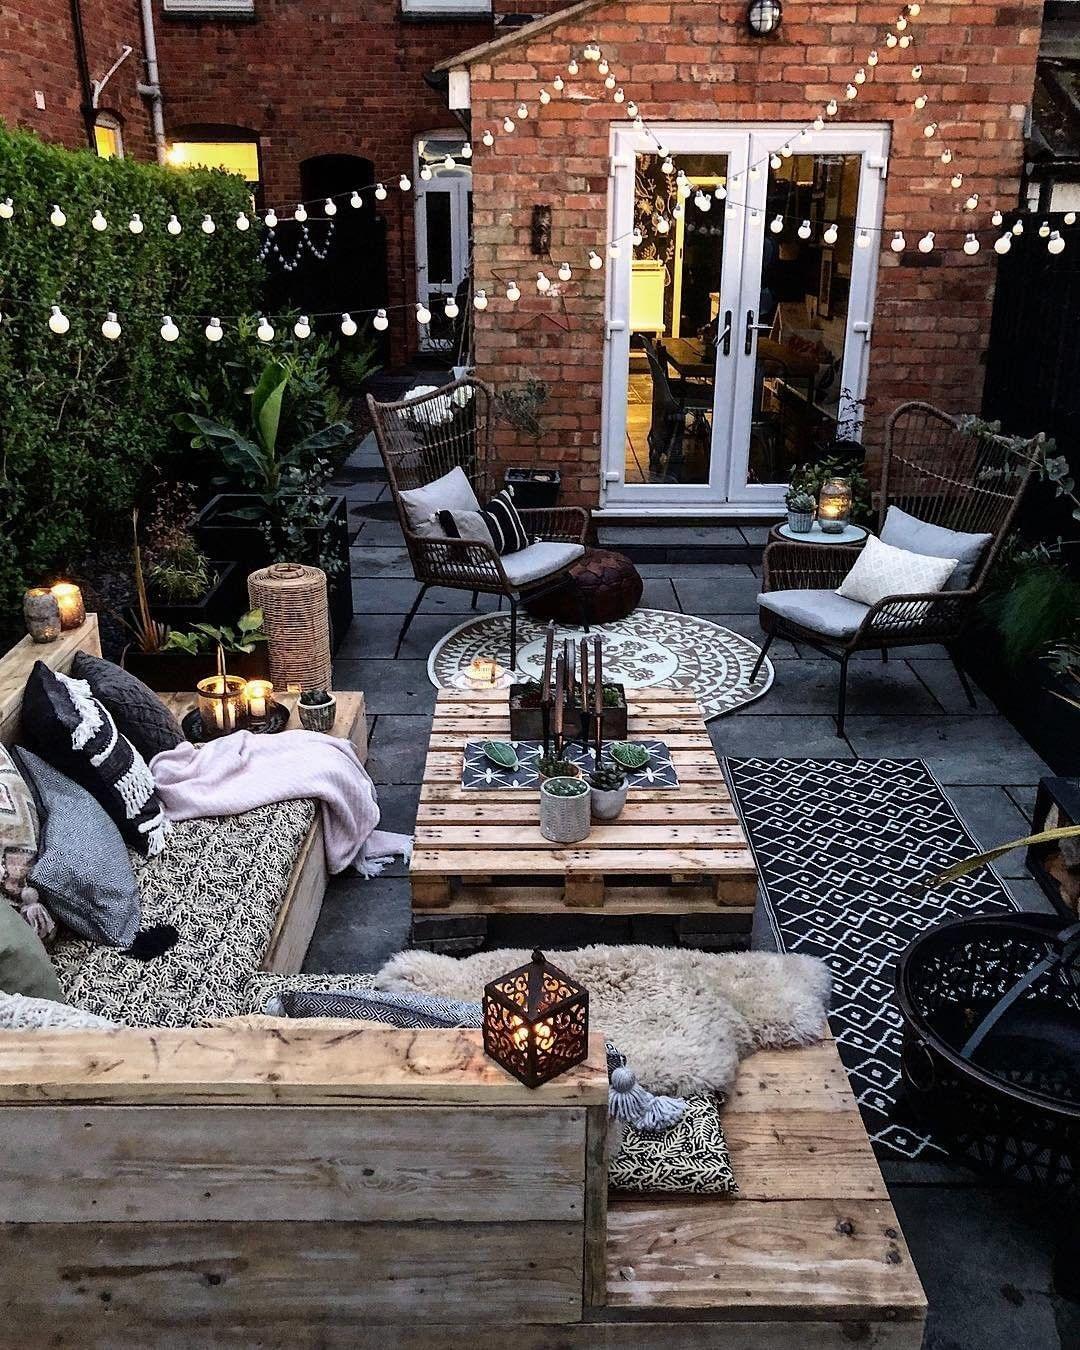 Apartment Therapy On Instagram If We Had A Backyard Space Like This We D Never Leave Image Theres Diseño De Patio Diseño De Terraza Decoración De Patio